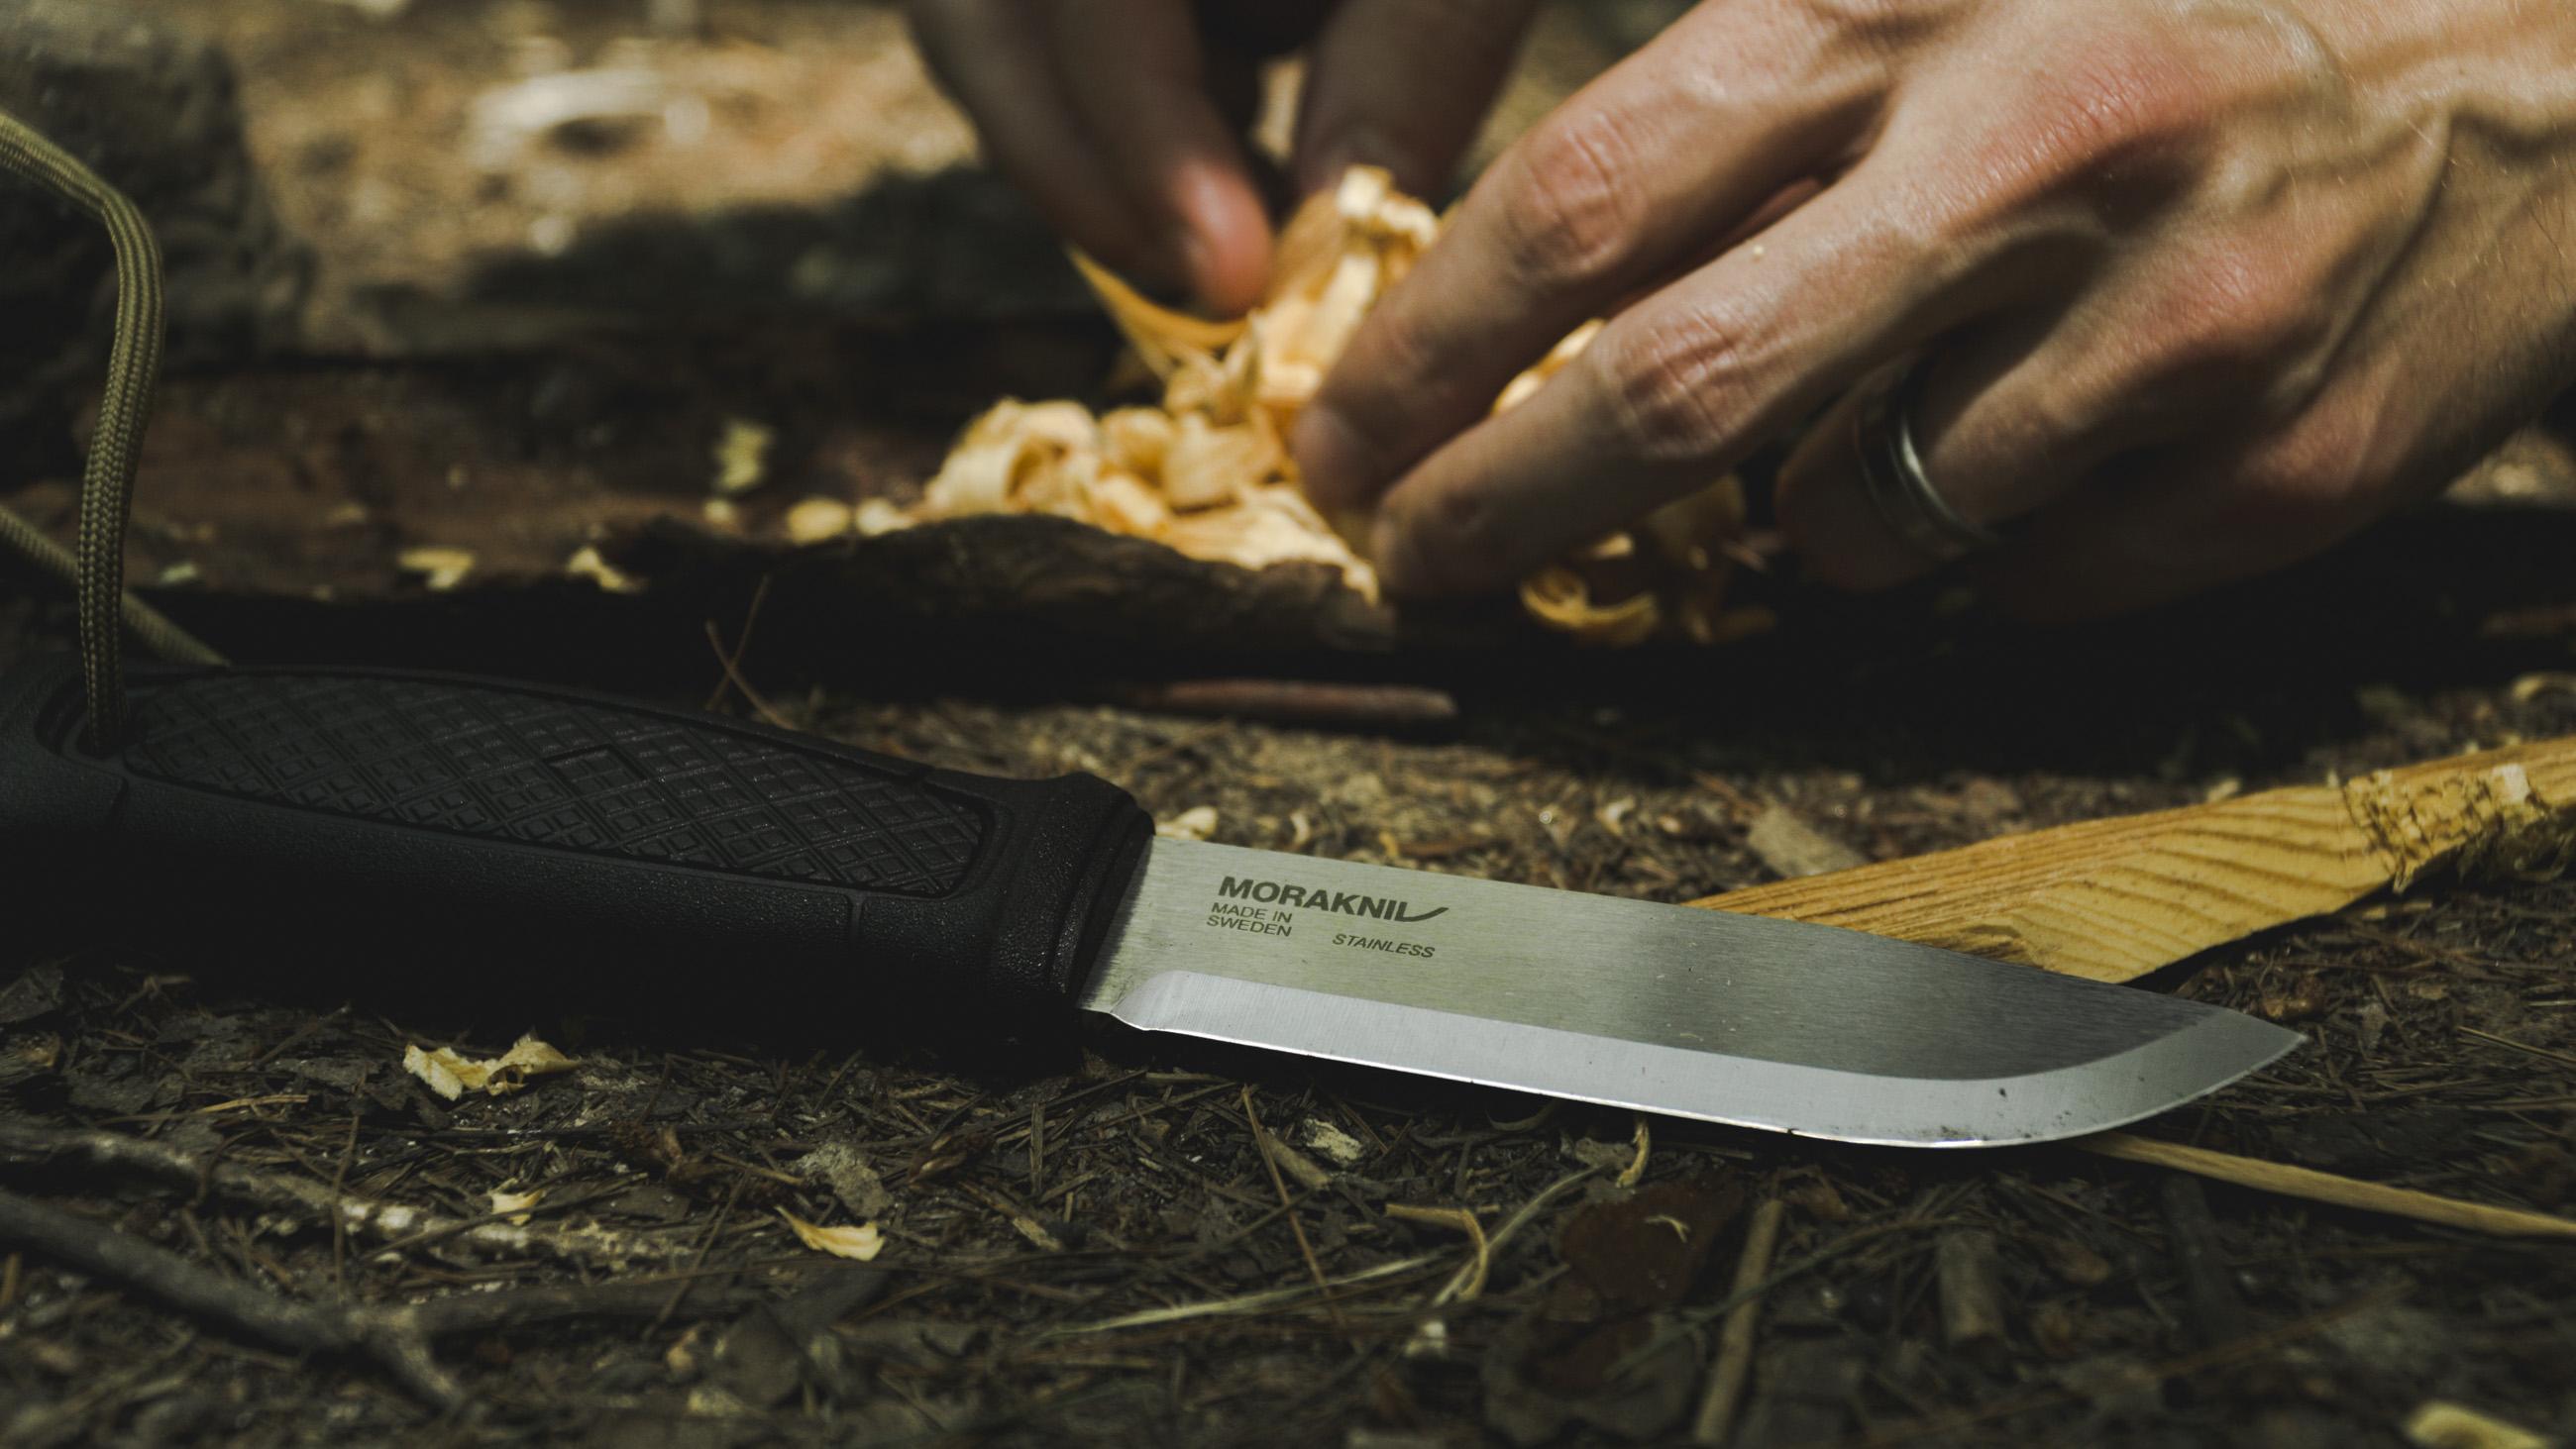 Mora Garberg Knife Review